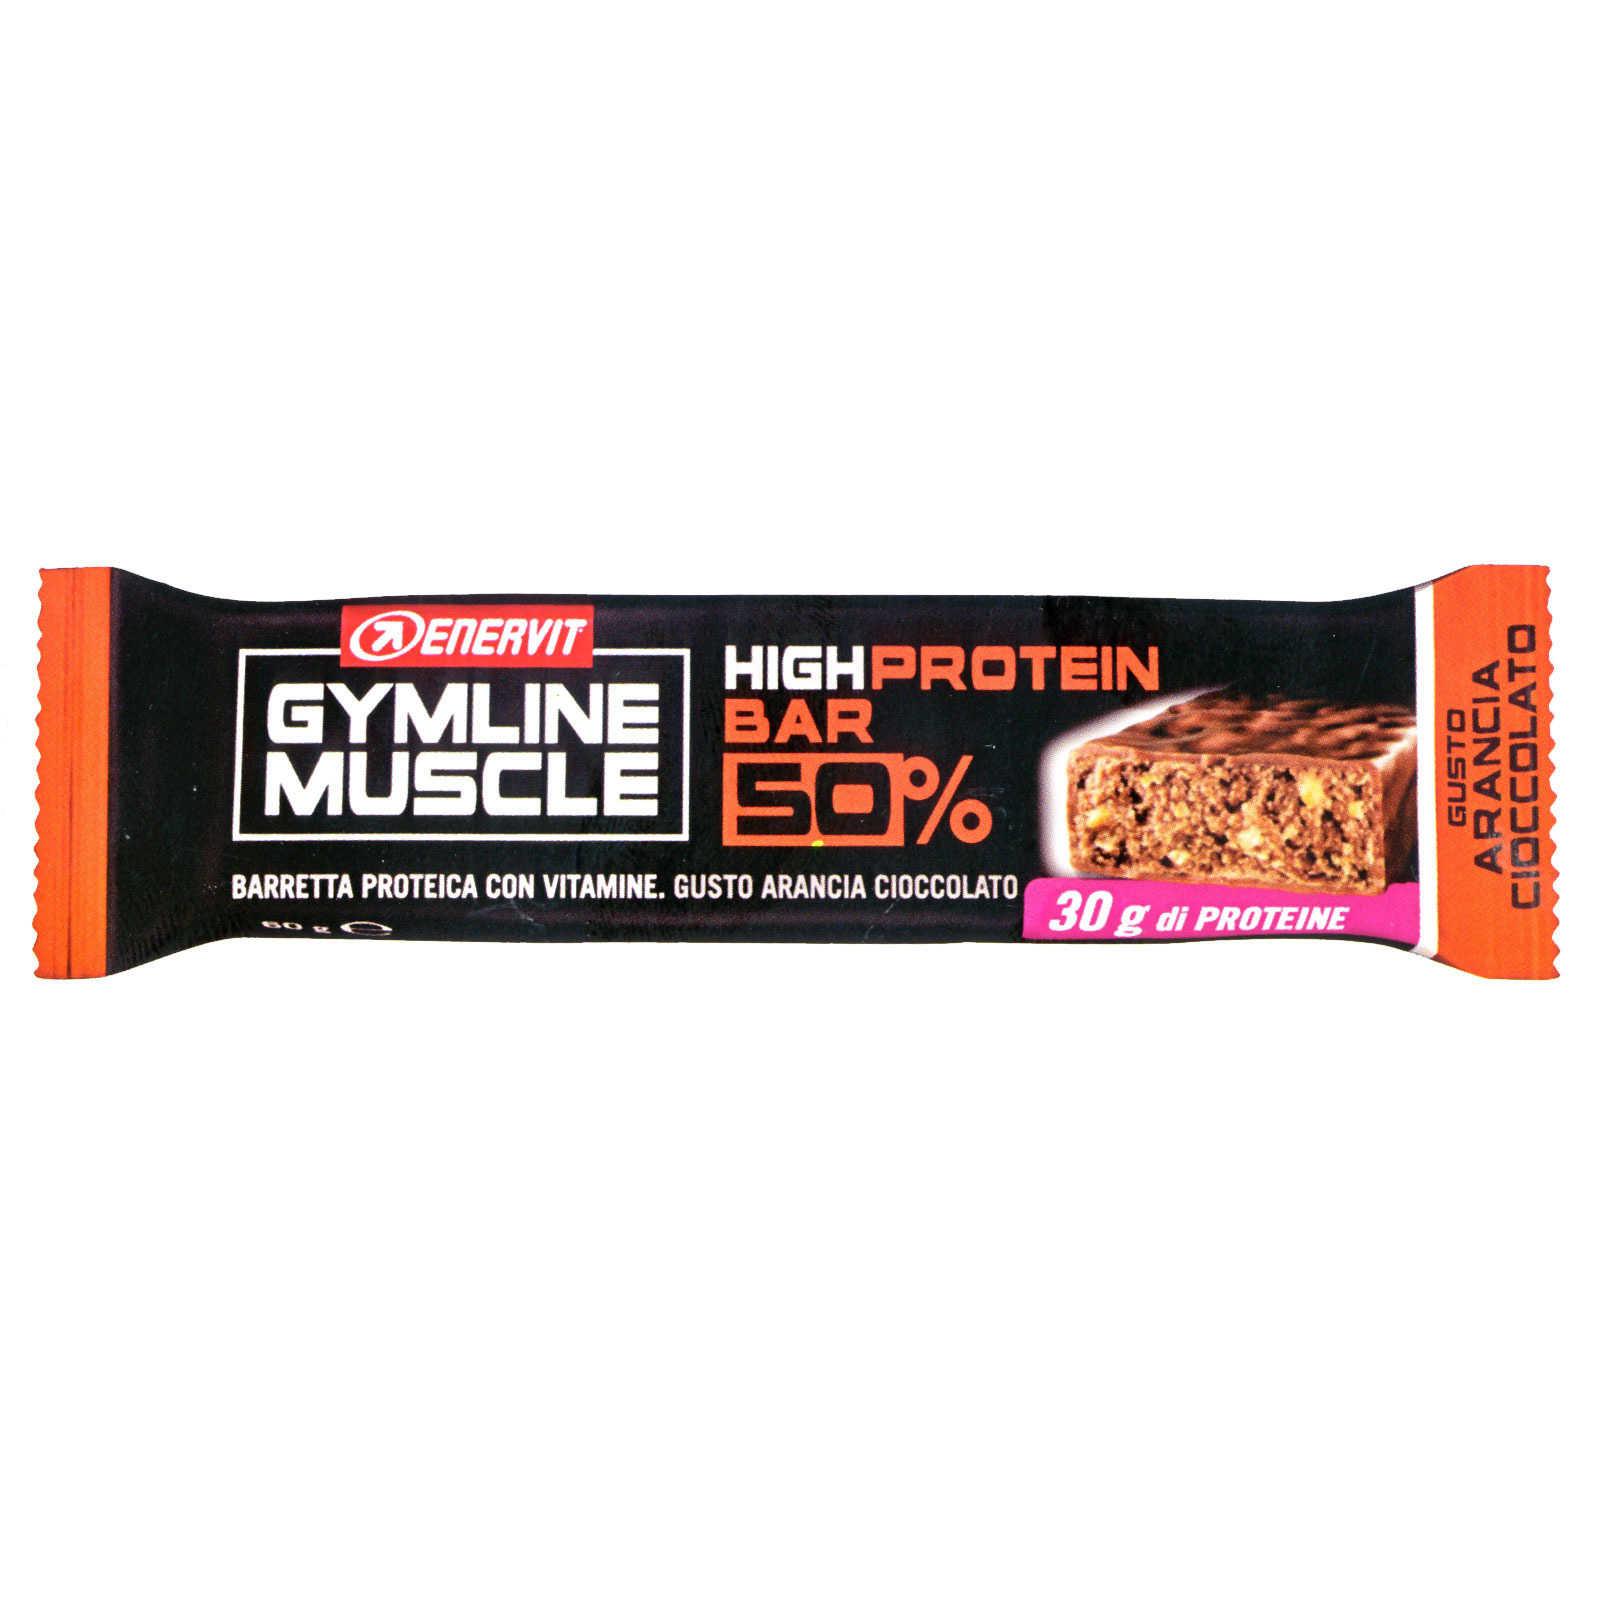 Enervit - Barretta proteica gusto Arancio Cioccolato - Gymline Muscle Protein Bar 50%